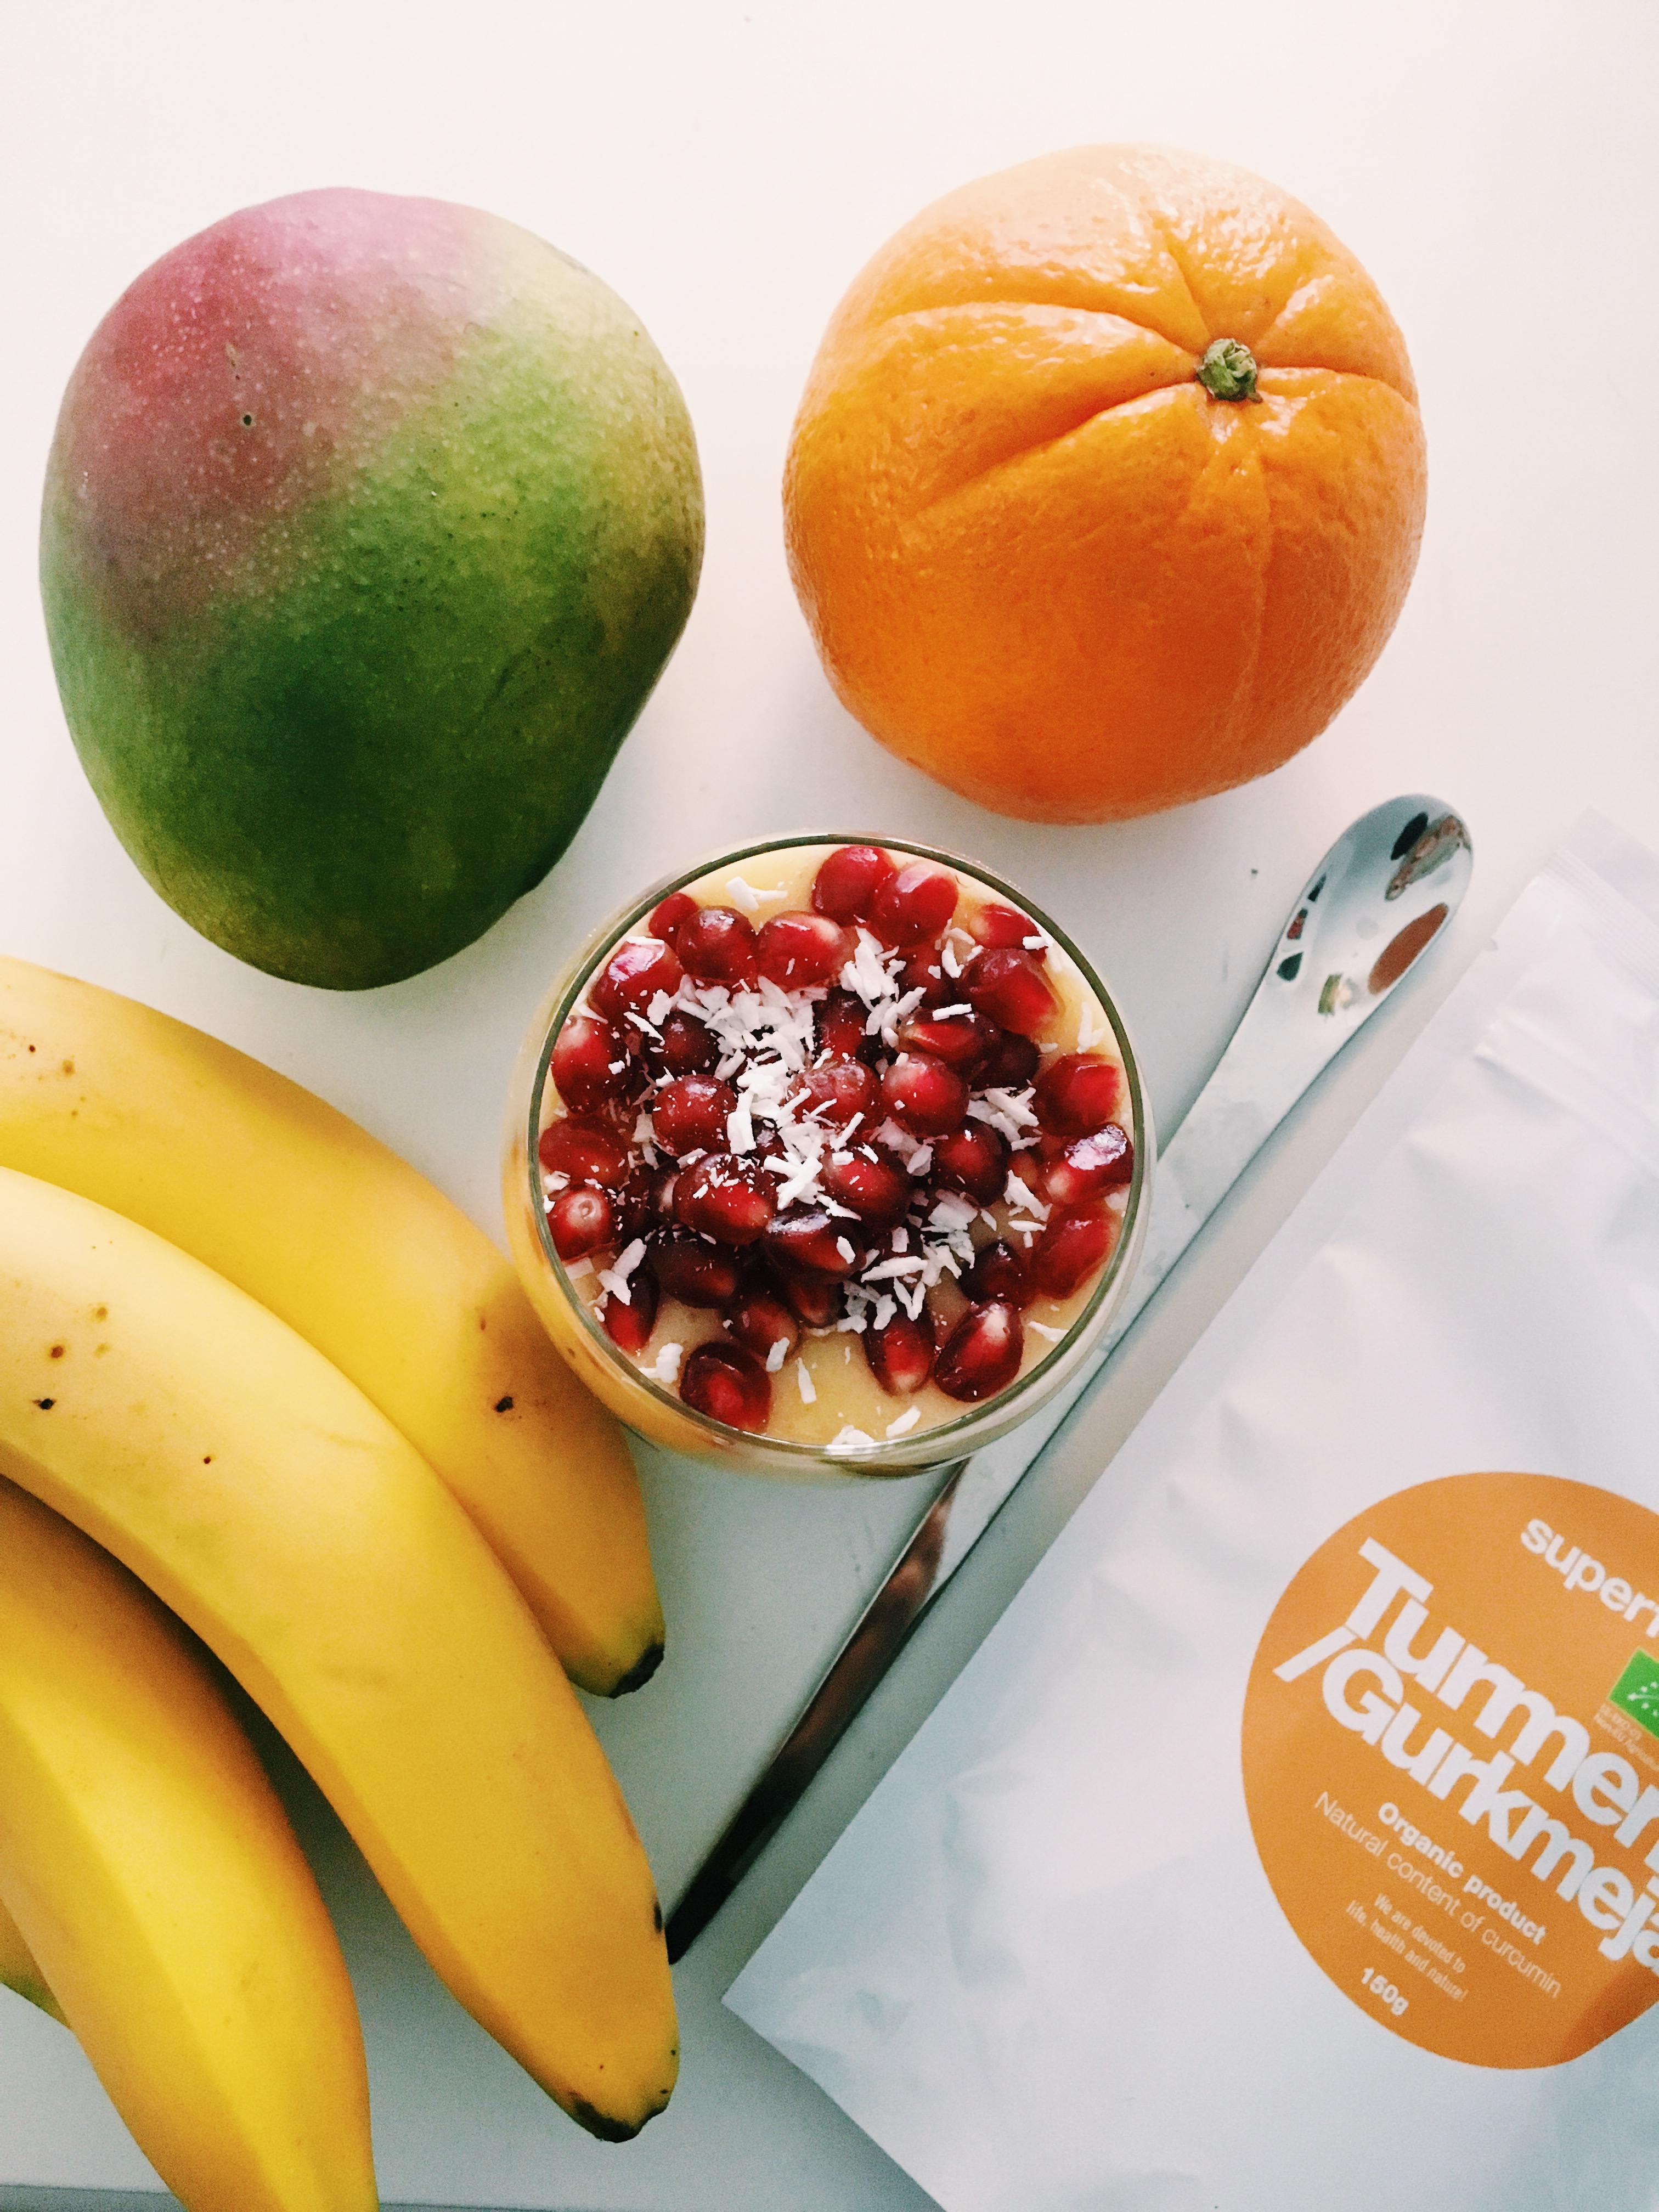 gurkmeja - chiapudding - superfruit - frukost